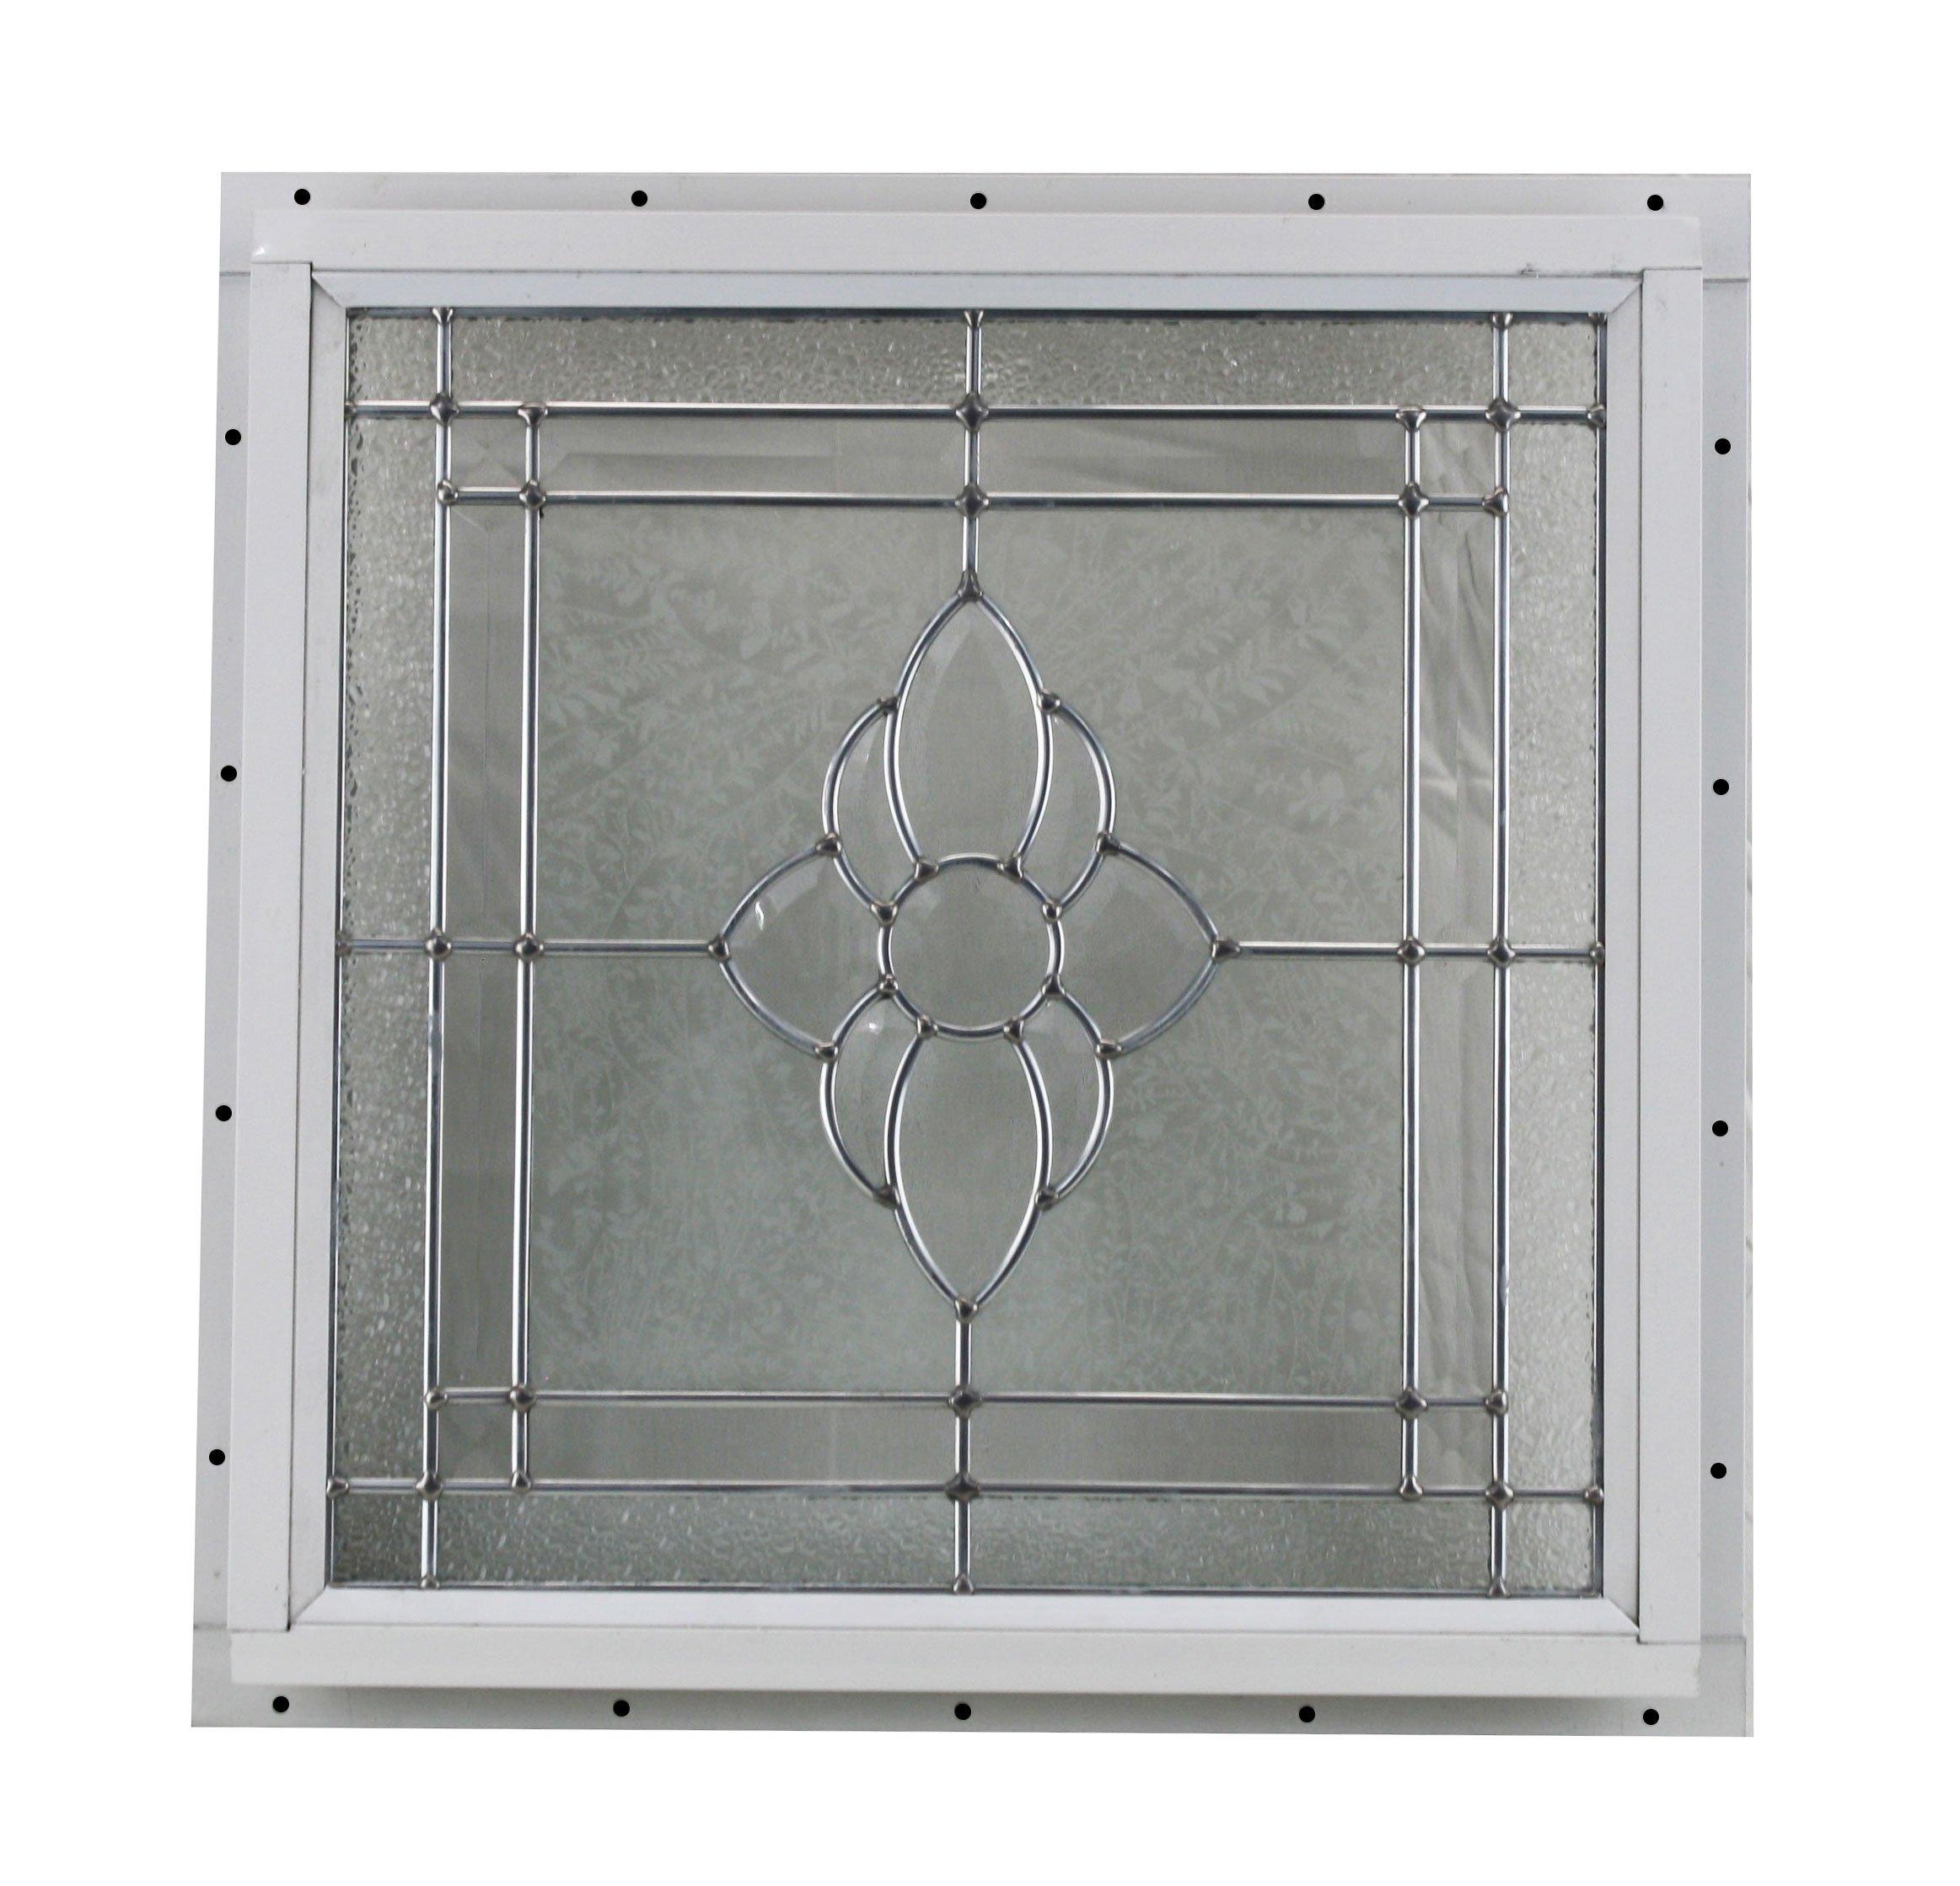 16'' x 16'' Decorative Cut Glass J-Channel Mount Shed Window